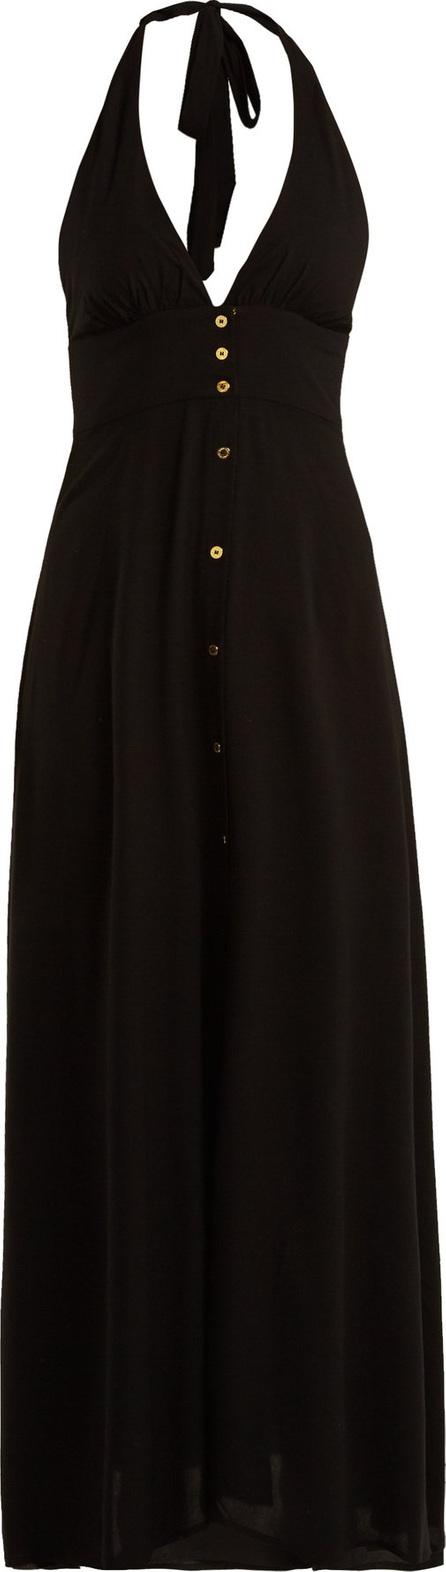 HEIDI KLEIN Oman halterneck dress